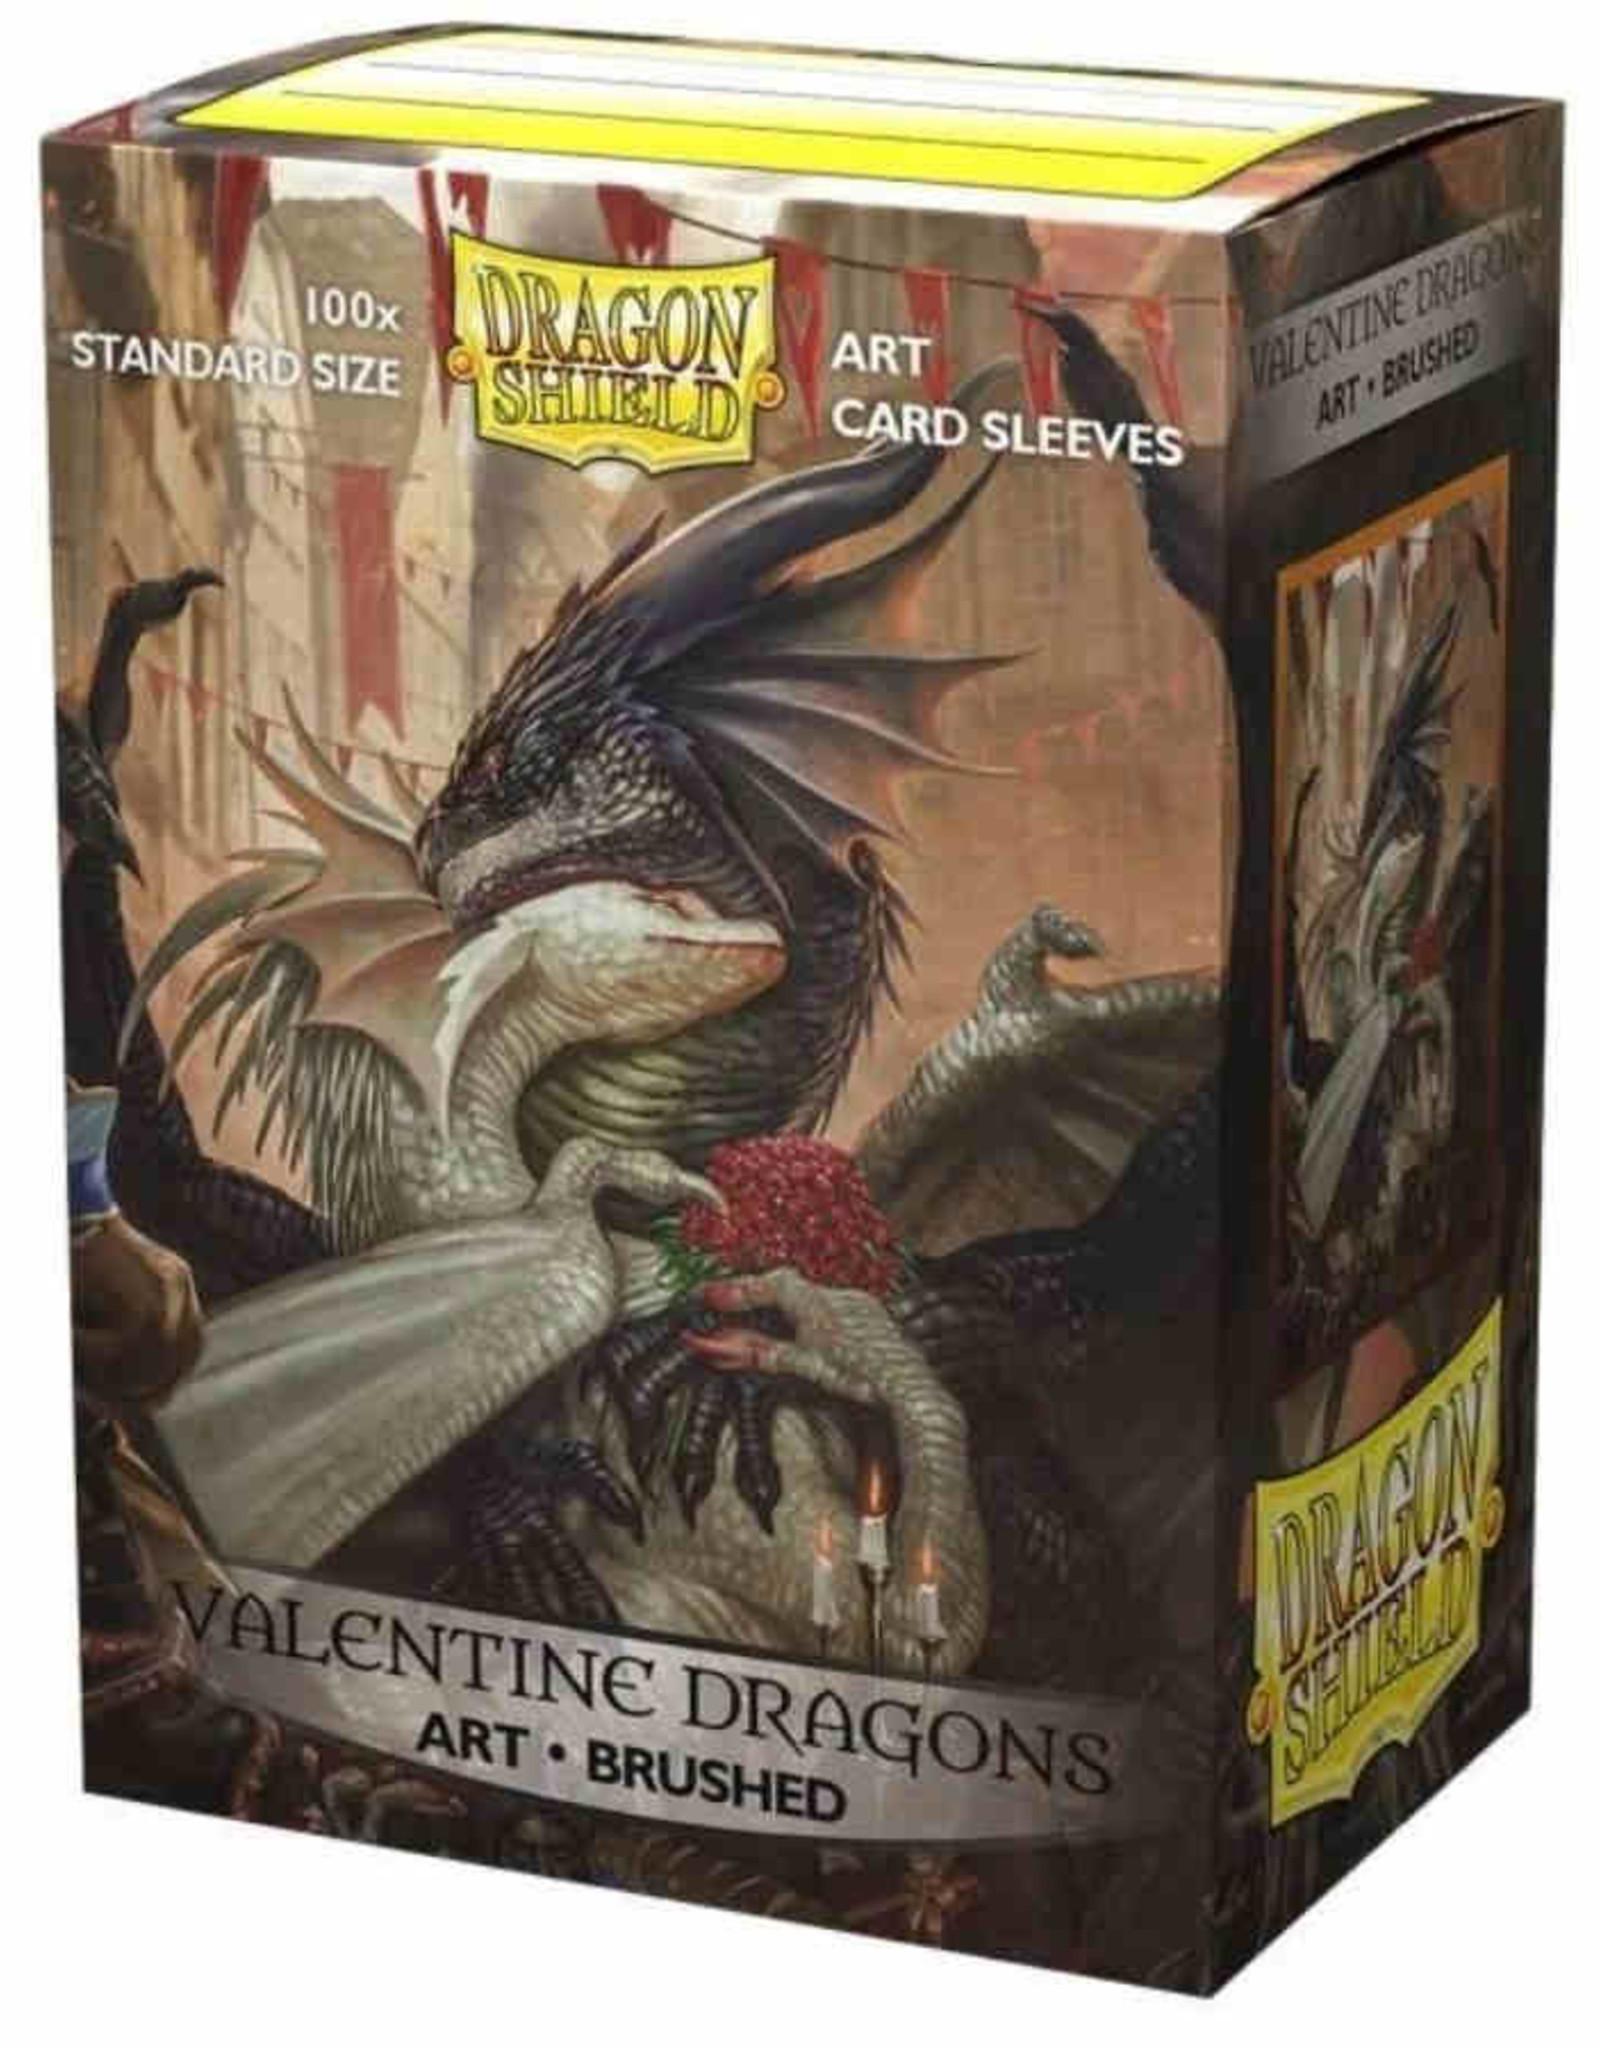 Arcane Tinmen Dragon Shield: Brushed Art: Valentine Dragon 2021